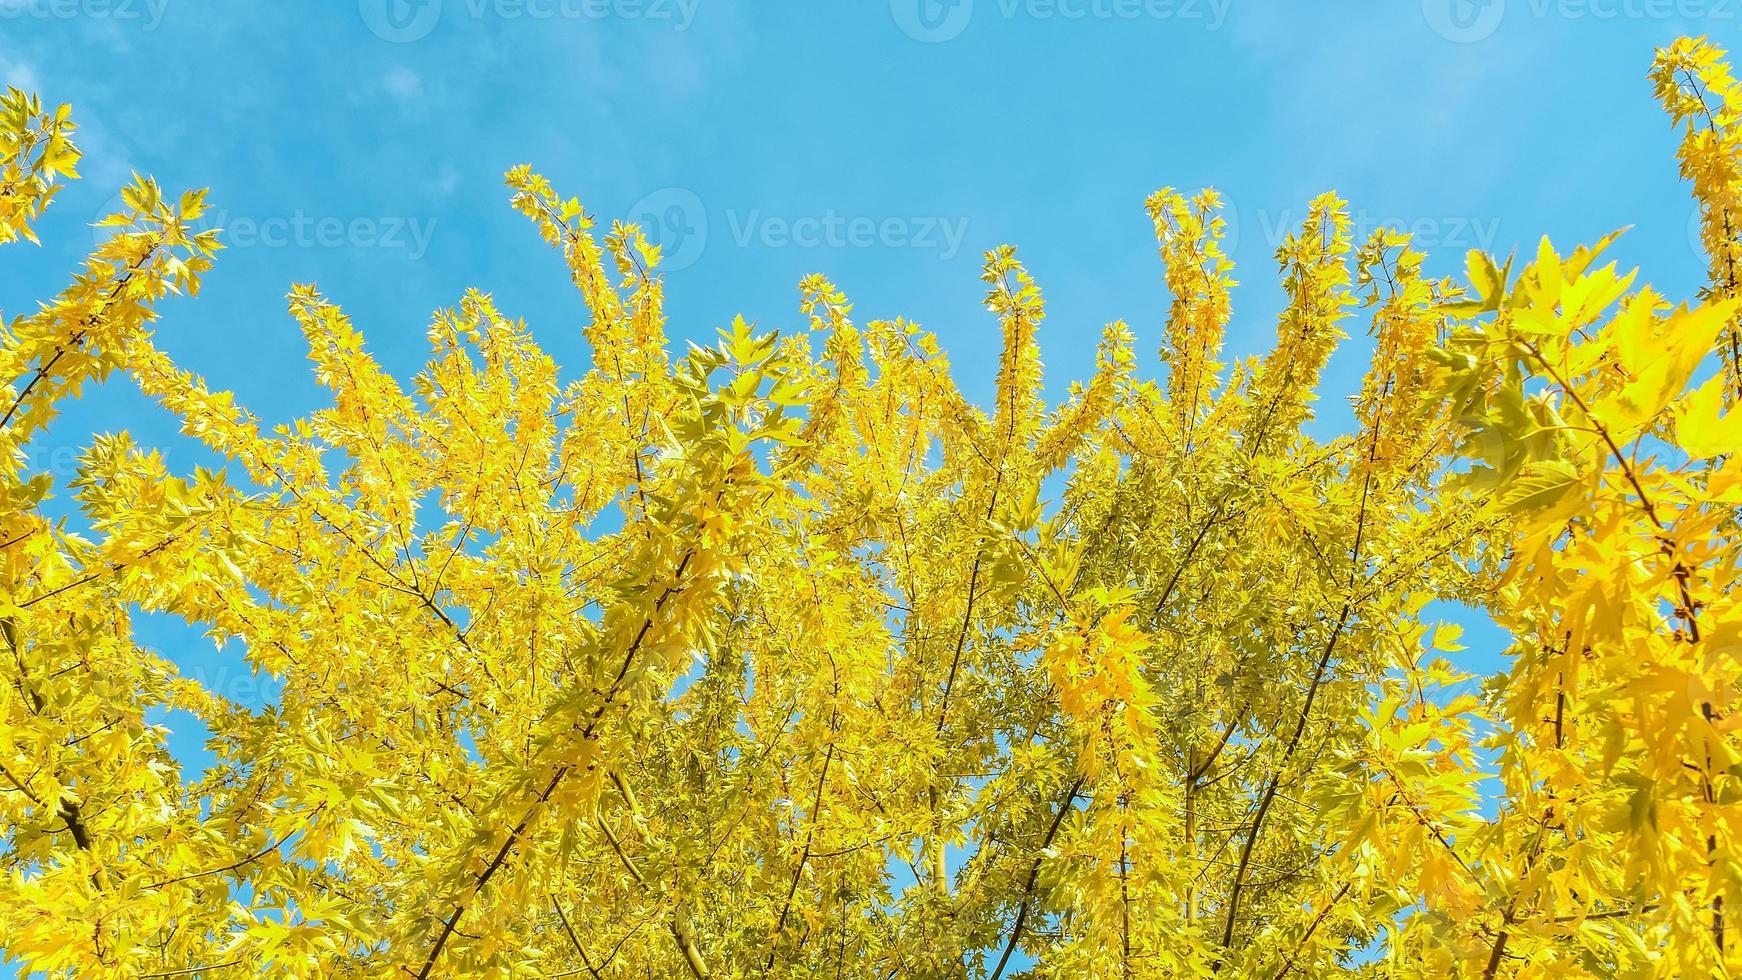 gelbe Blätter des Baumes foto